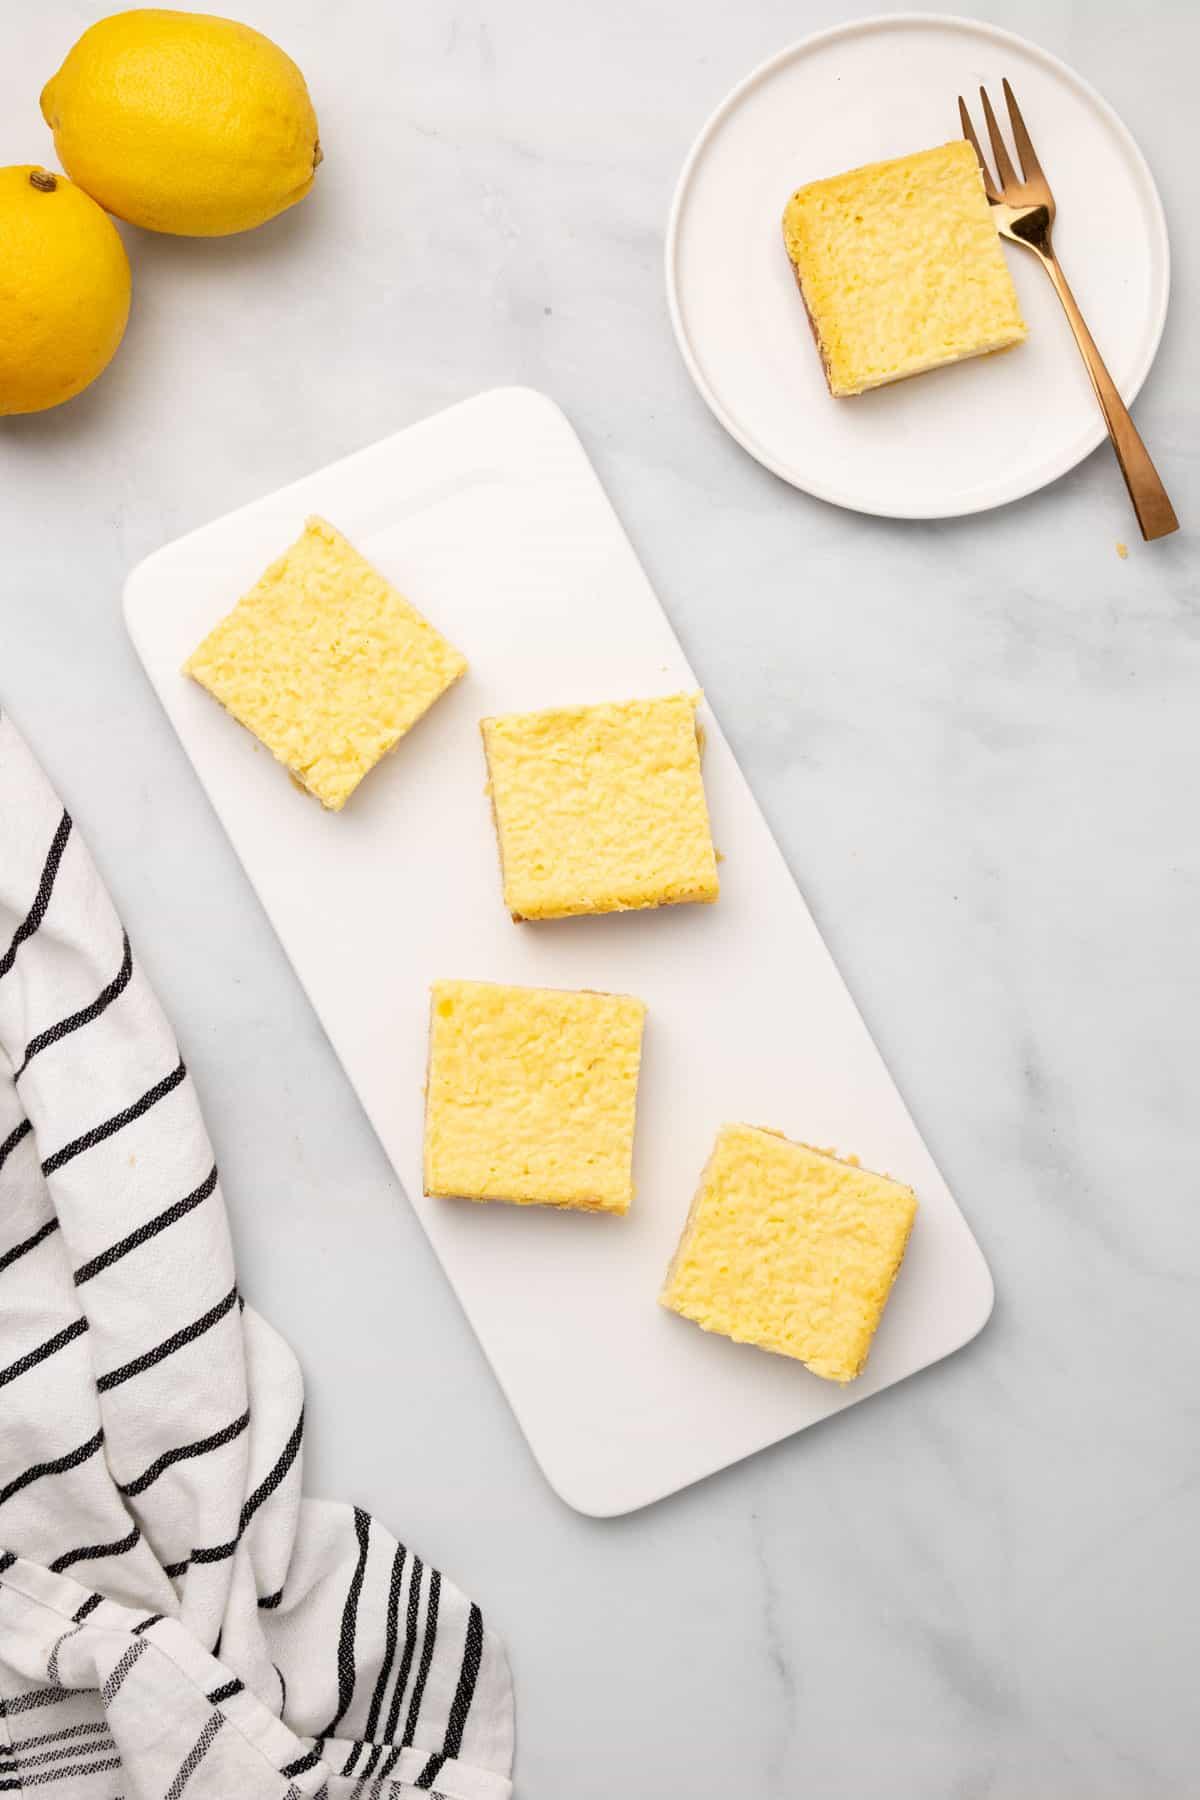 baked lemon bars ready to serve